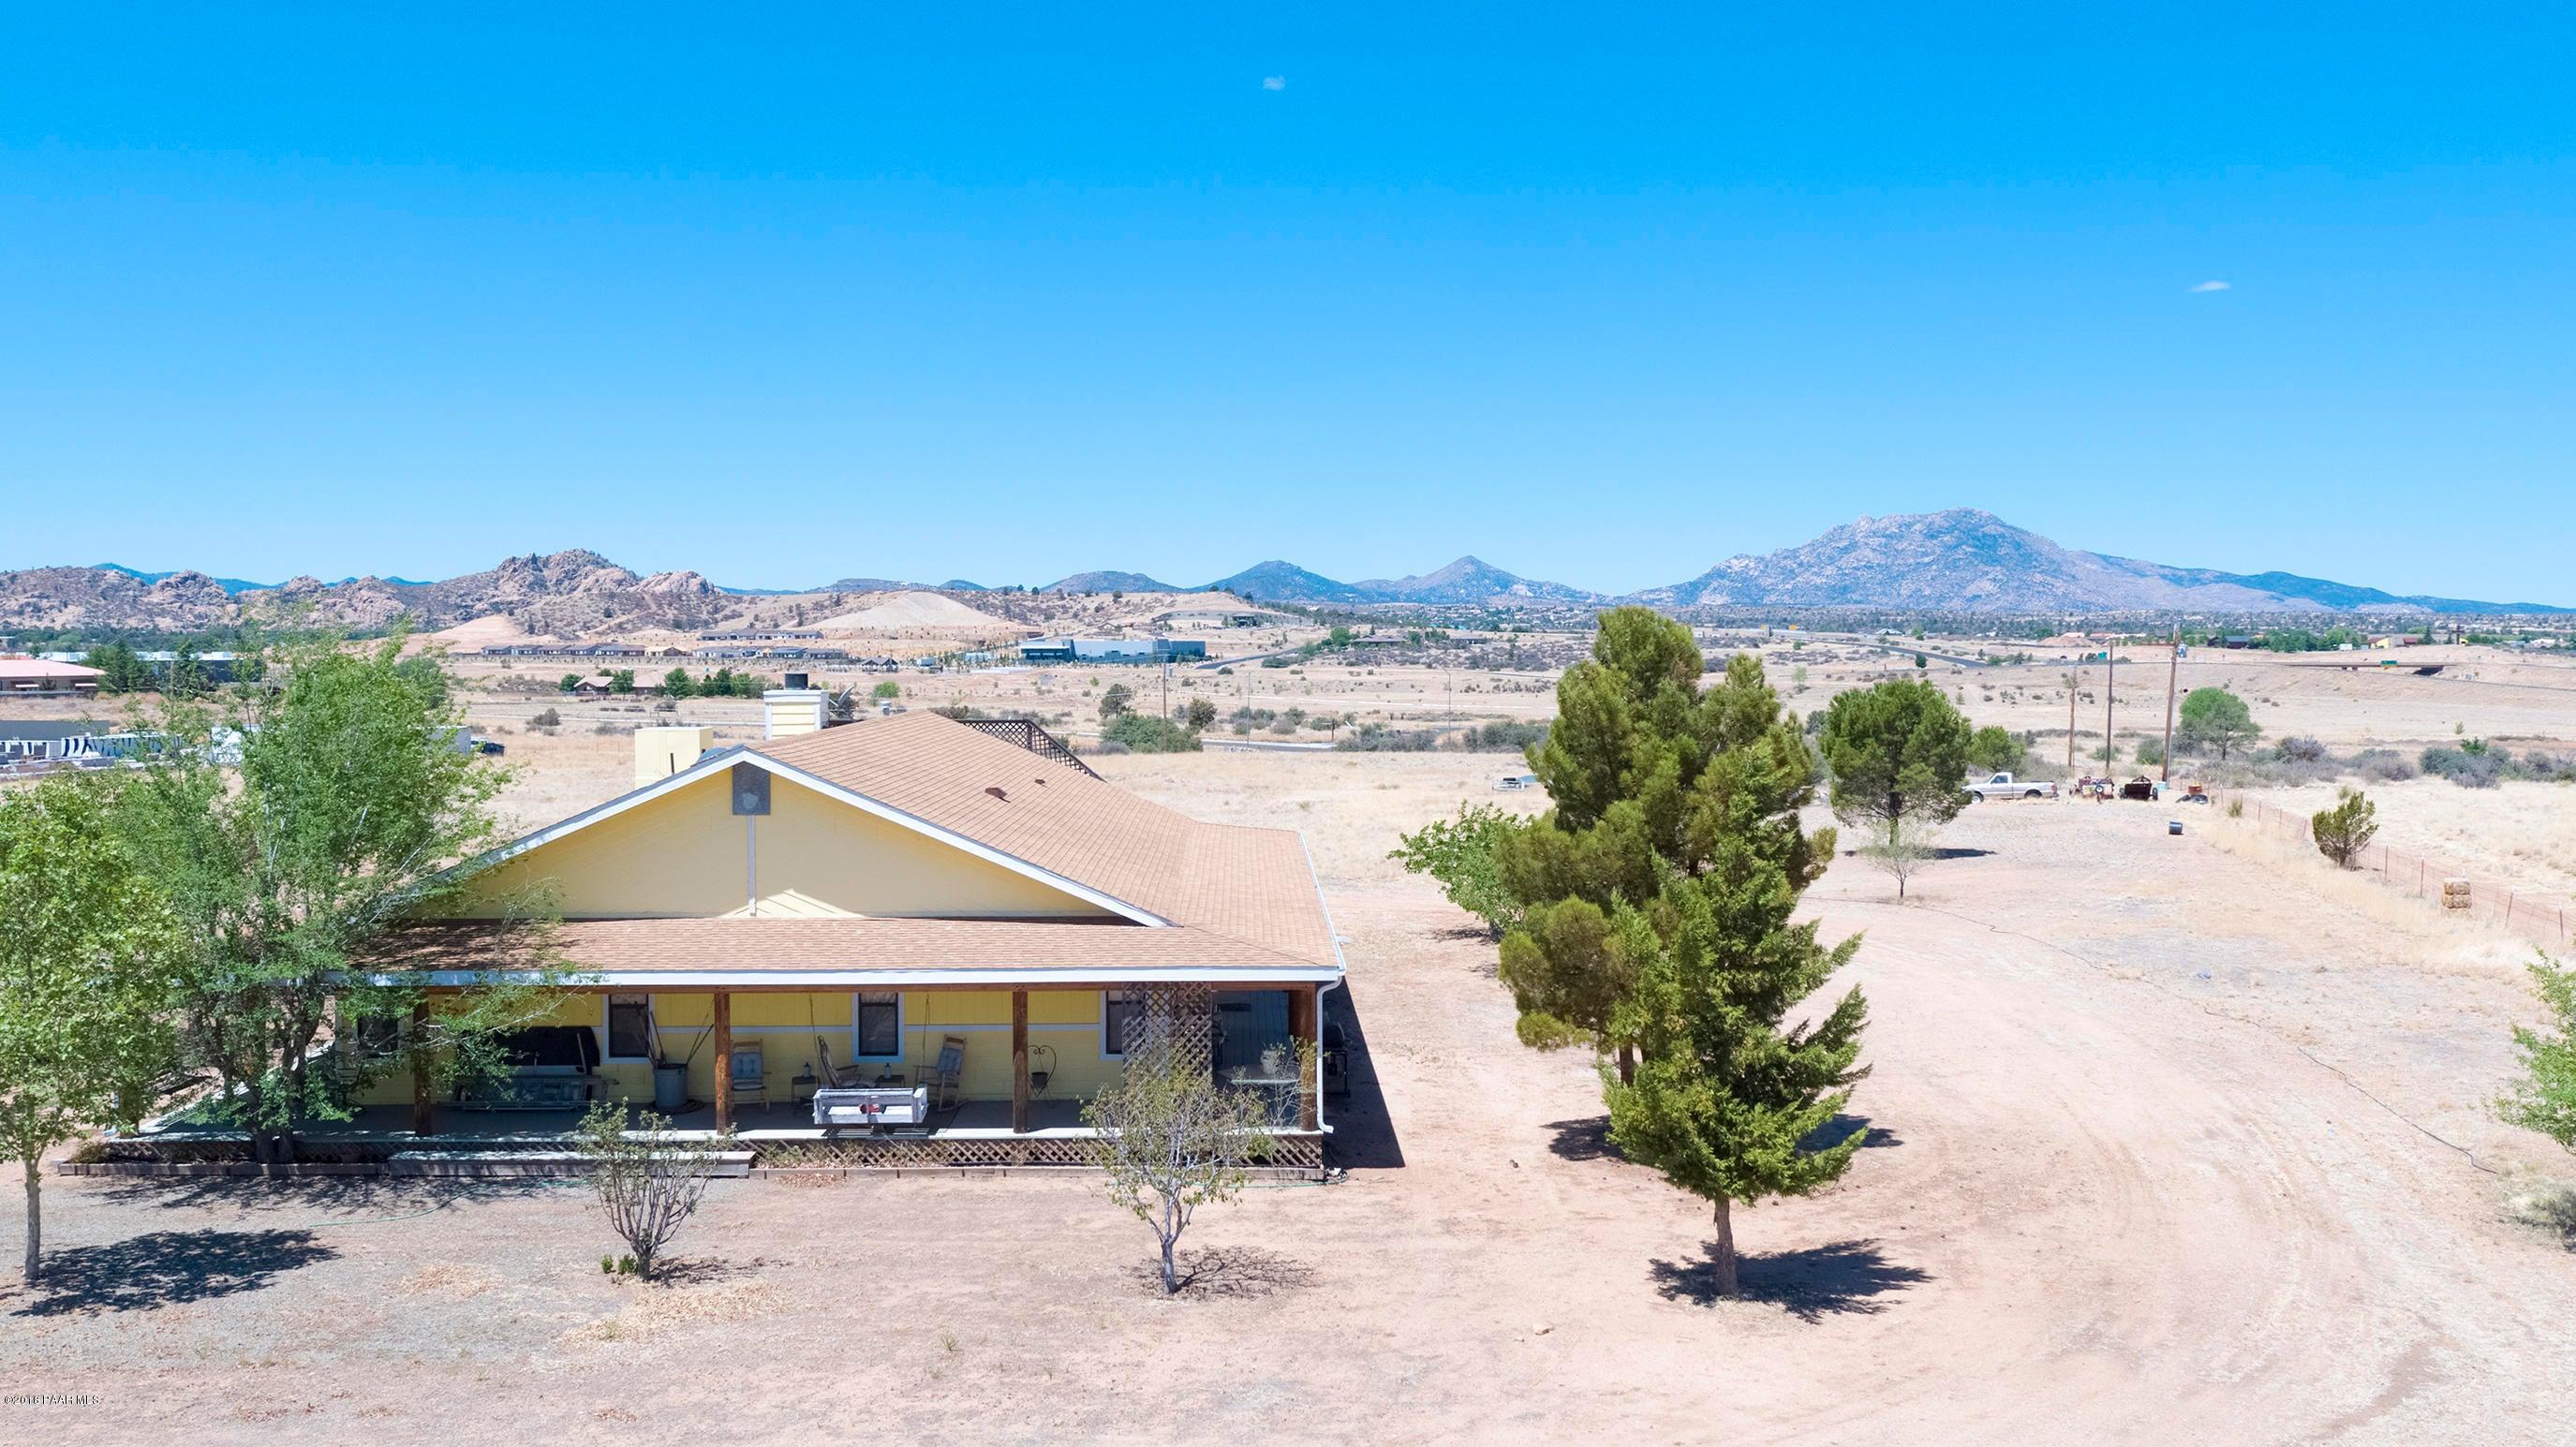 5450 Side Road Prescott, AZ 86301 - MLS #: 1012475